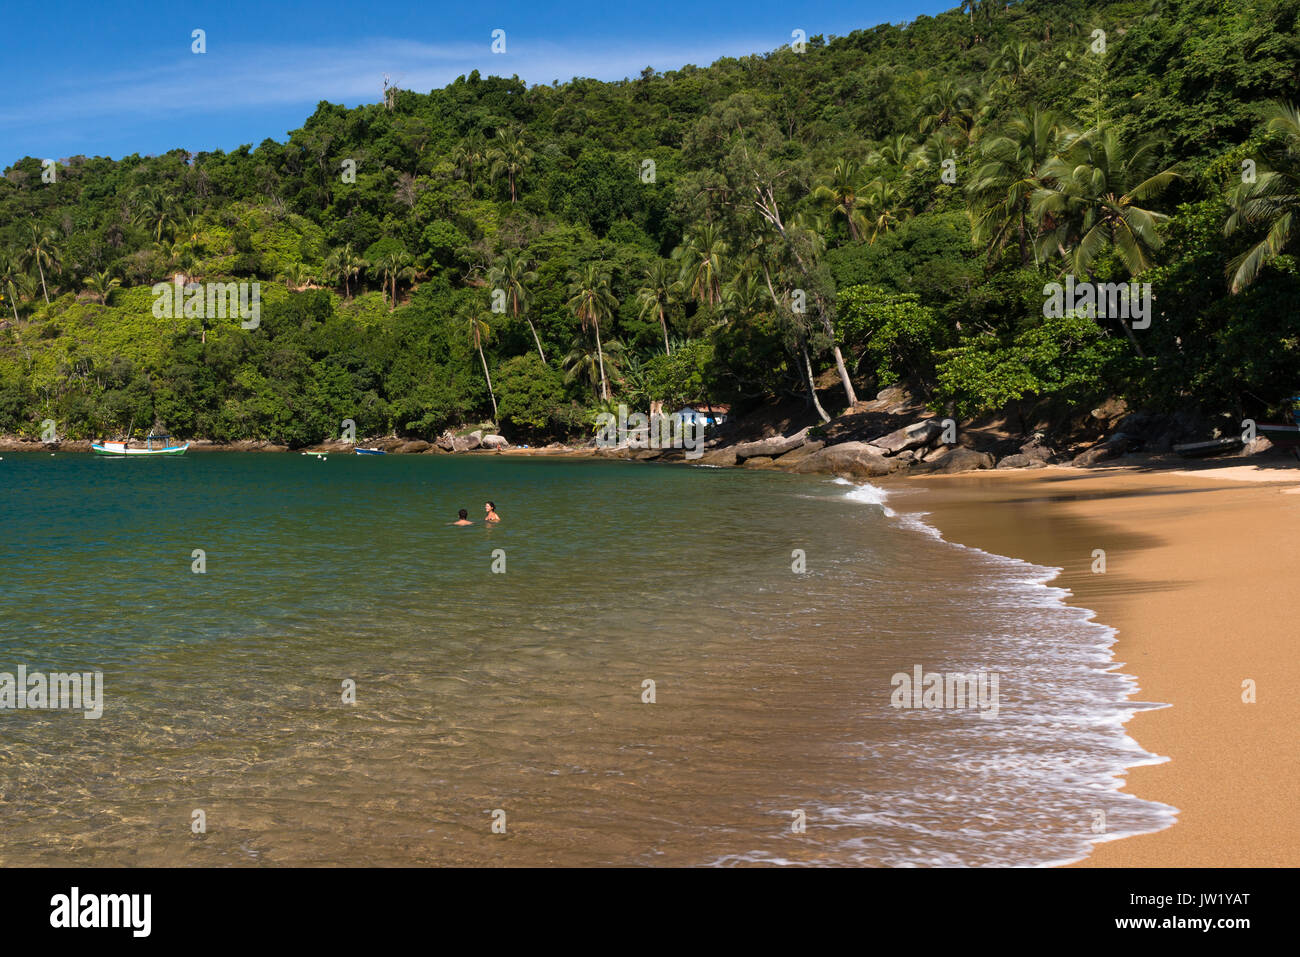 Fome Beach in Ilhabela, Brazil Stock Photo